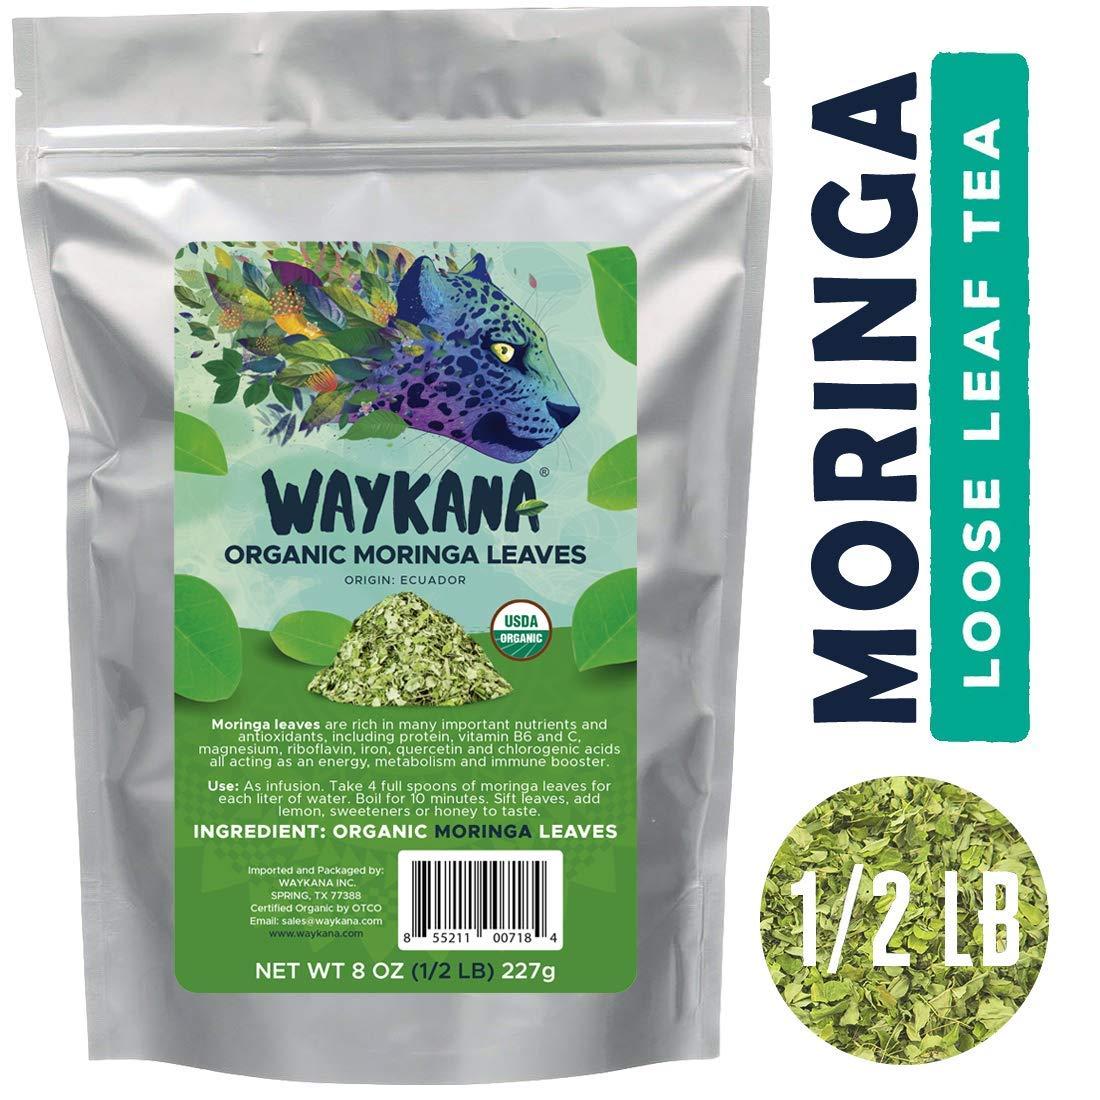 WAYKANA Organic Moringa Leaf, 8 Ounce | Multi Vitamins Premium Quality Nutritious Loose Leaf Tea